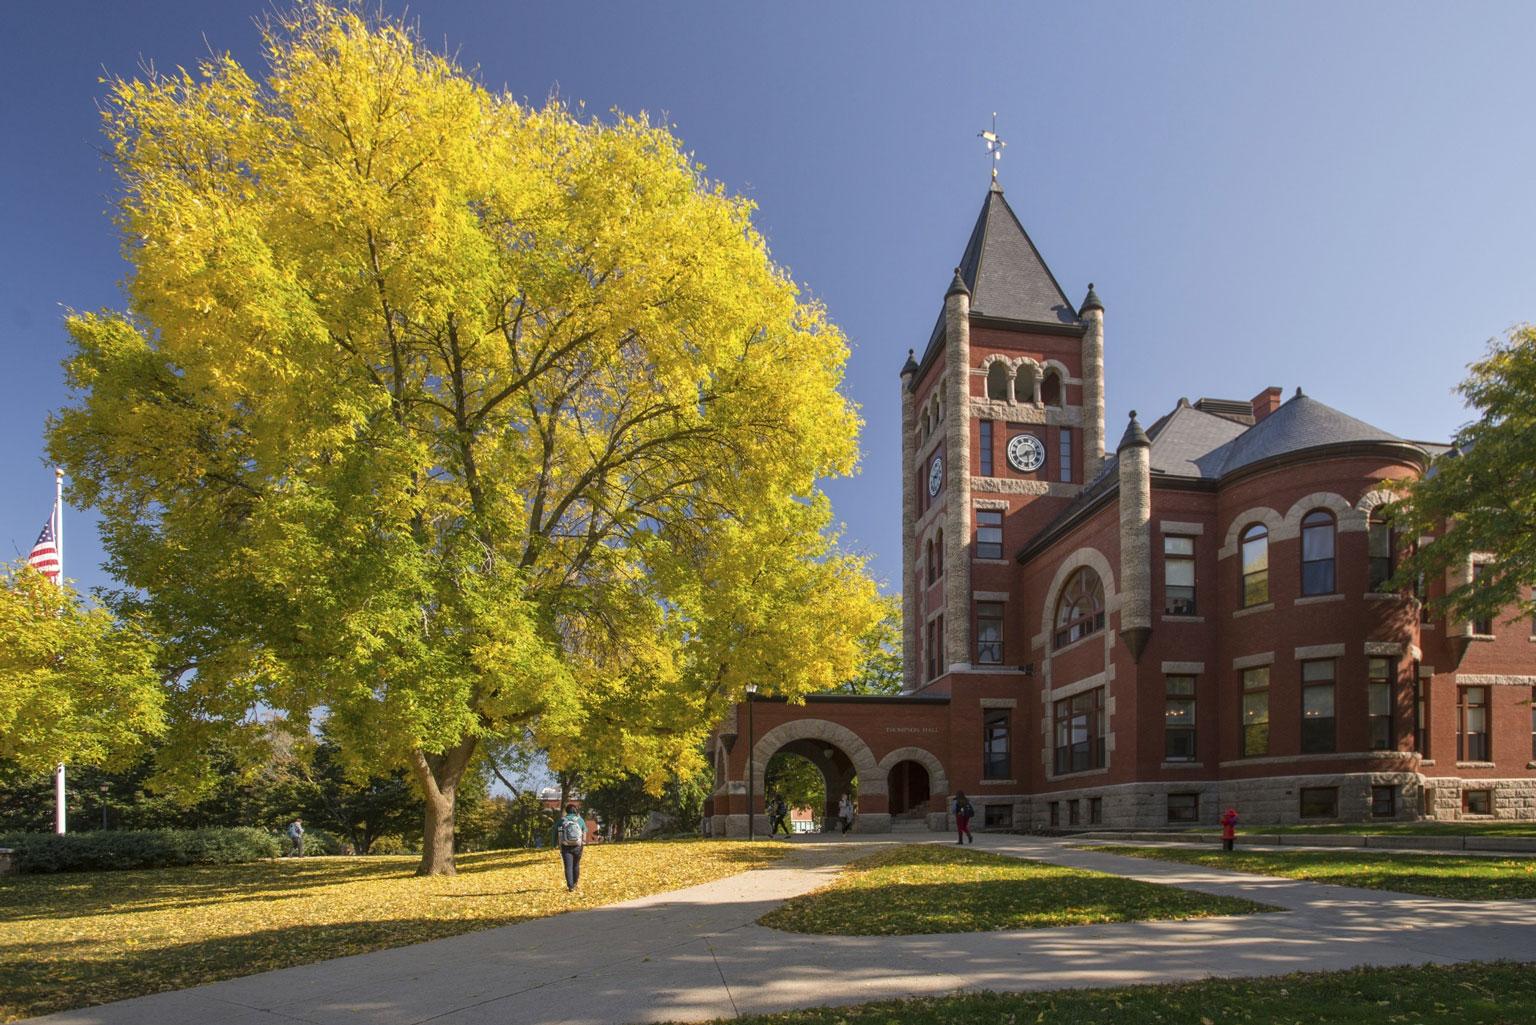 University of New Hampshire Thompson Hall in autumn.